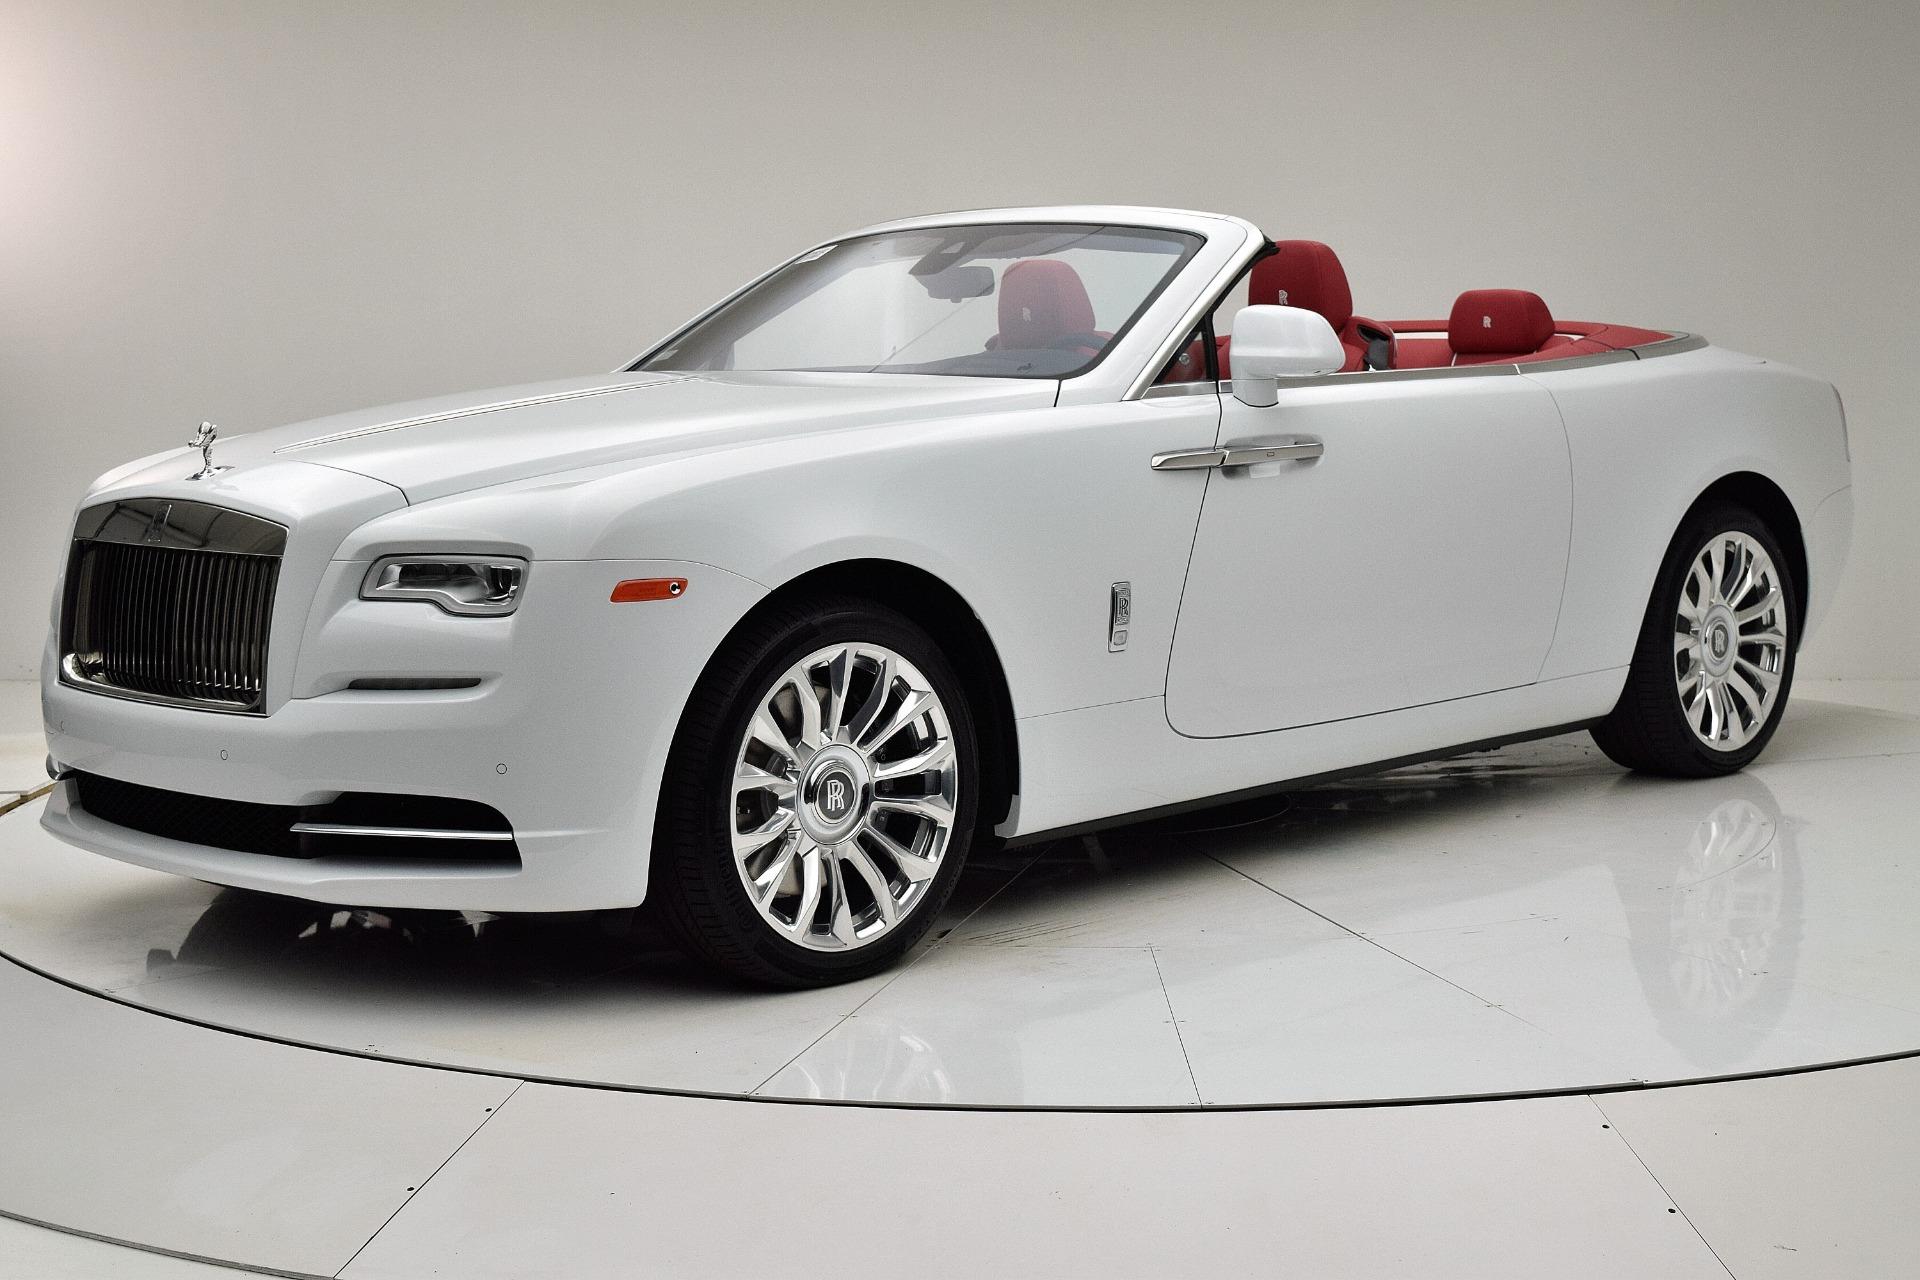 Used 2020 Rolls-Royce Dawn BASE for sale $399,880 at Bentley Palmyra N.J. in Palmyra NJ 08065 2